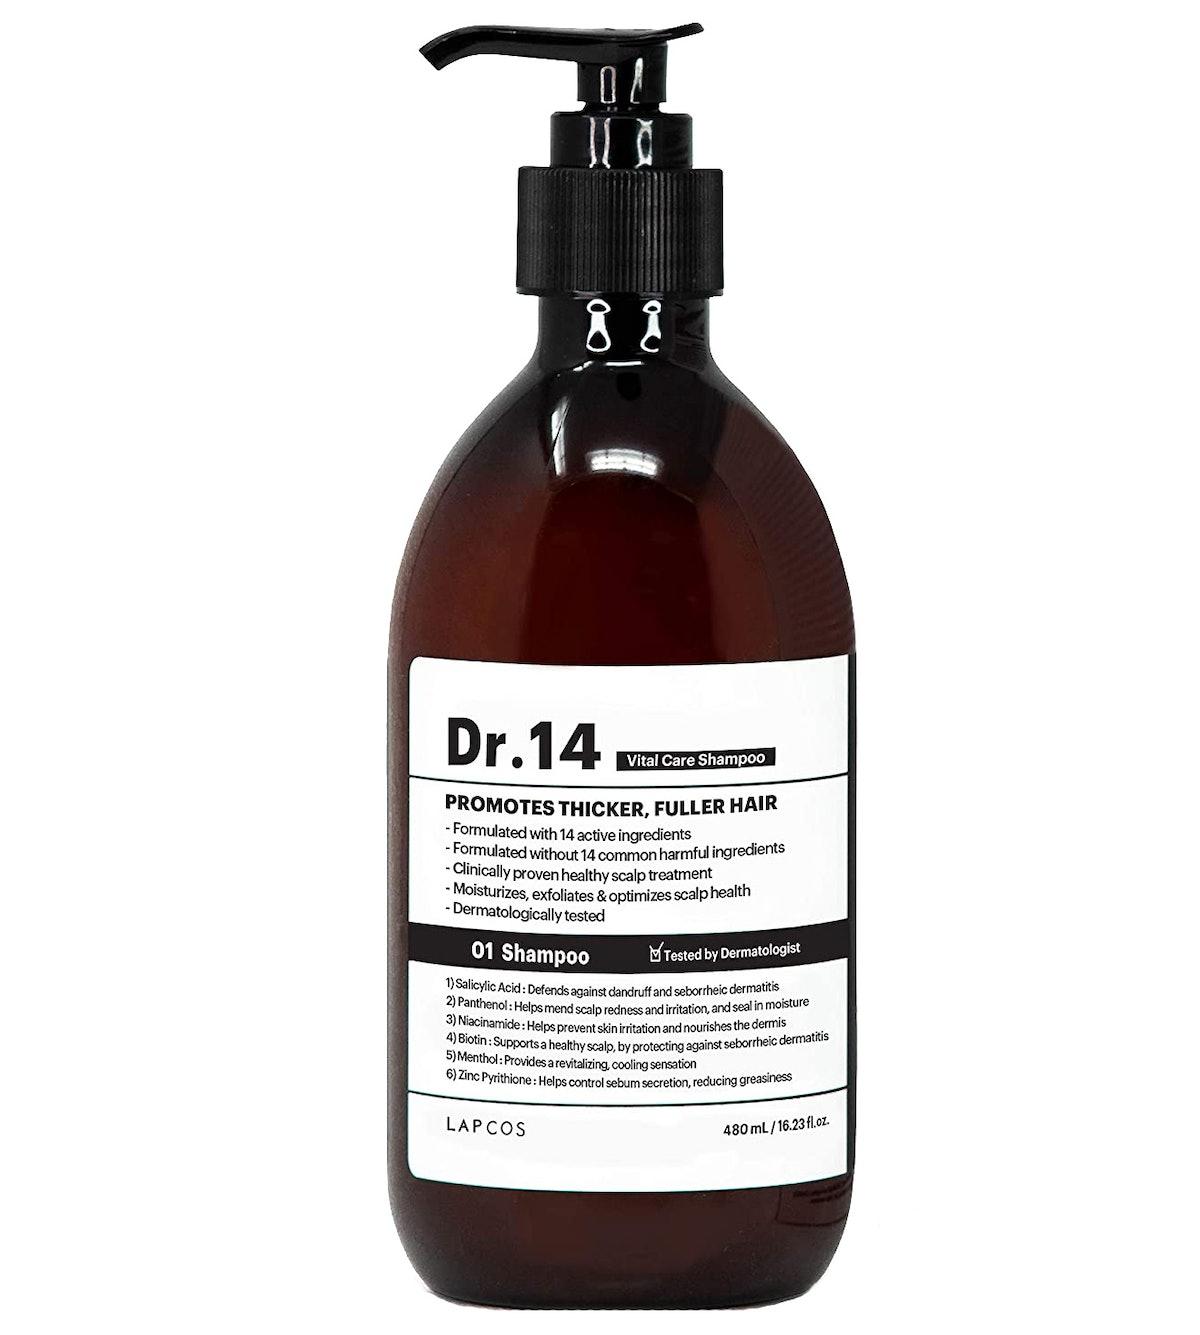 Lapcos Dr. 14 Vital Care Shampoo